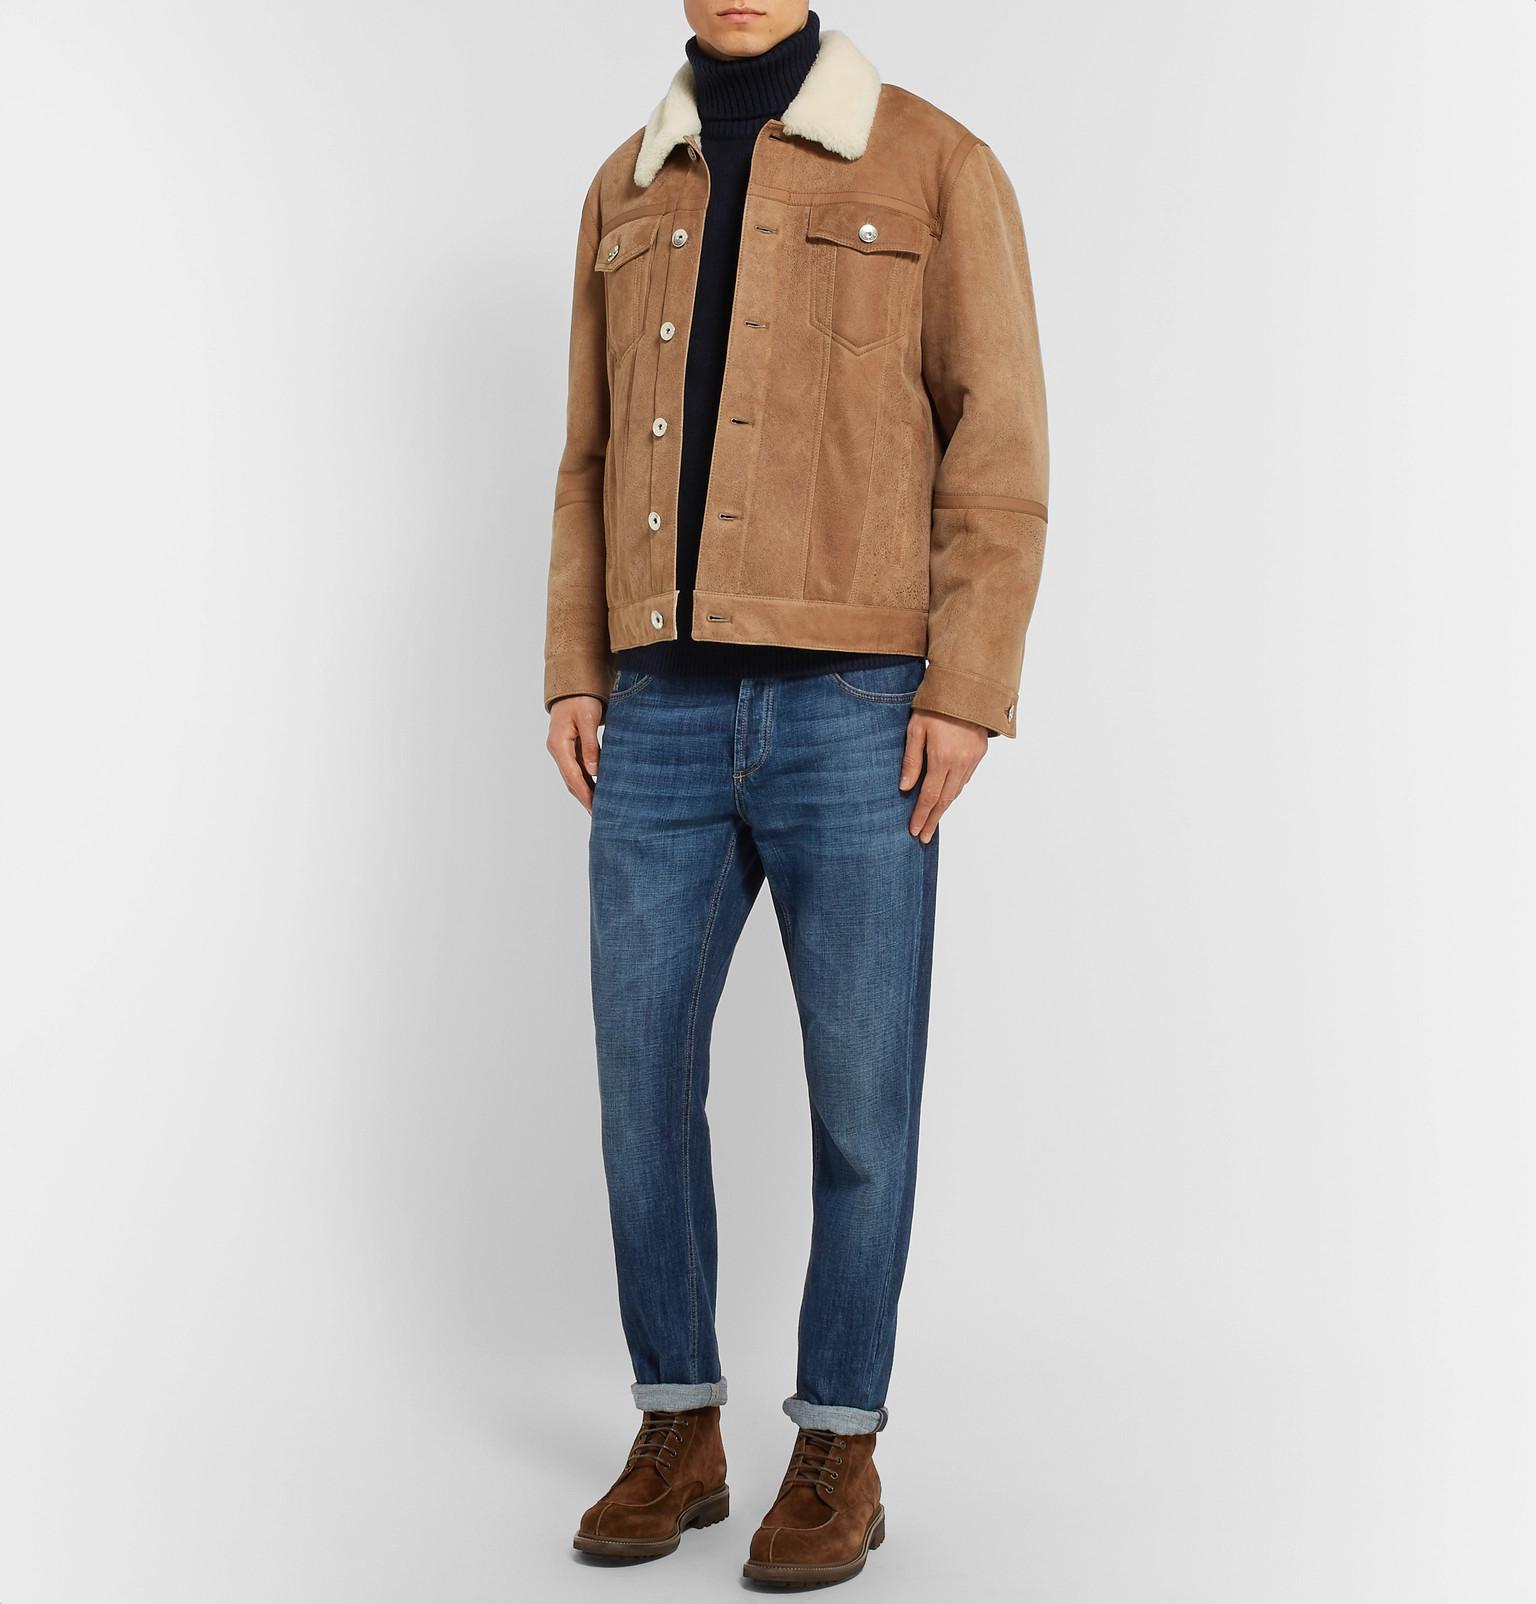 Rollneck Men For Sweater Cashmere Blue Lyst View Fullscreen Brioni RwqE4pW